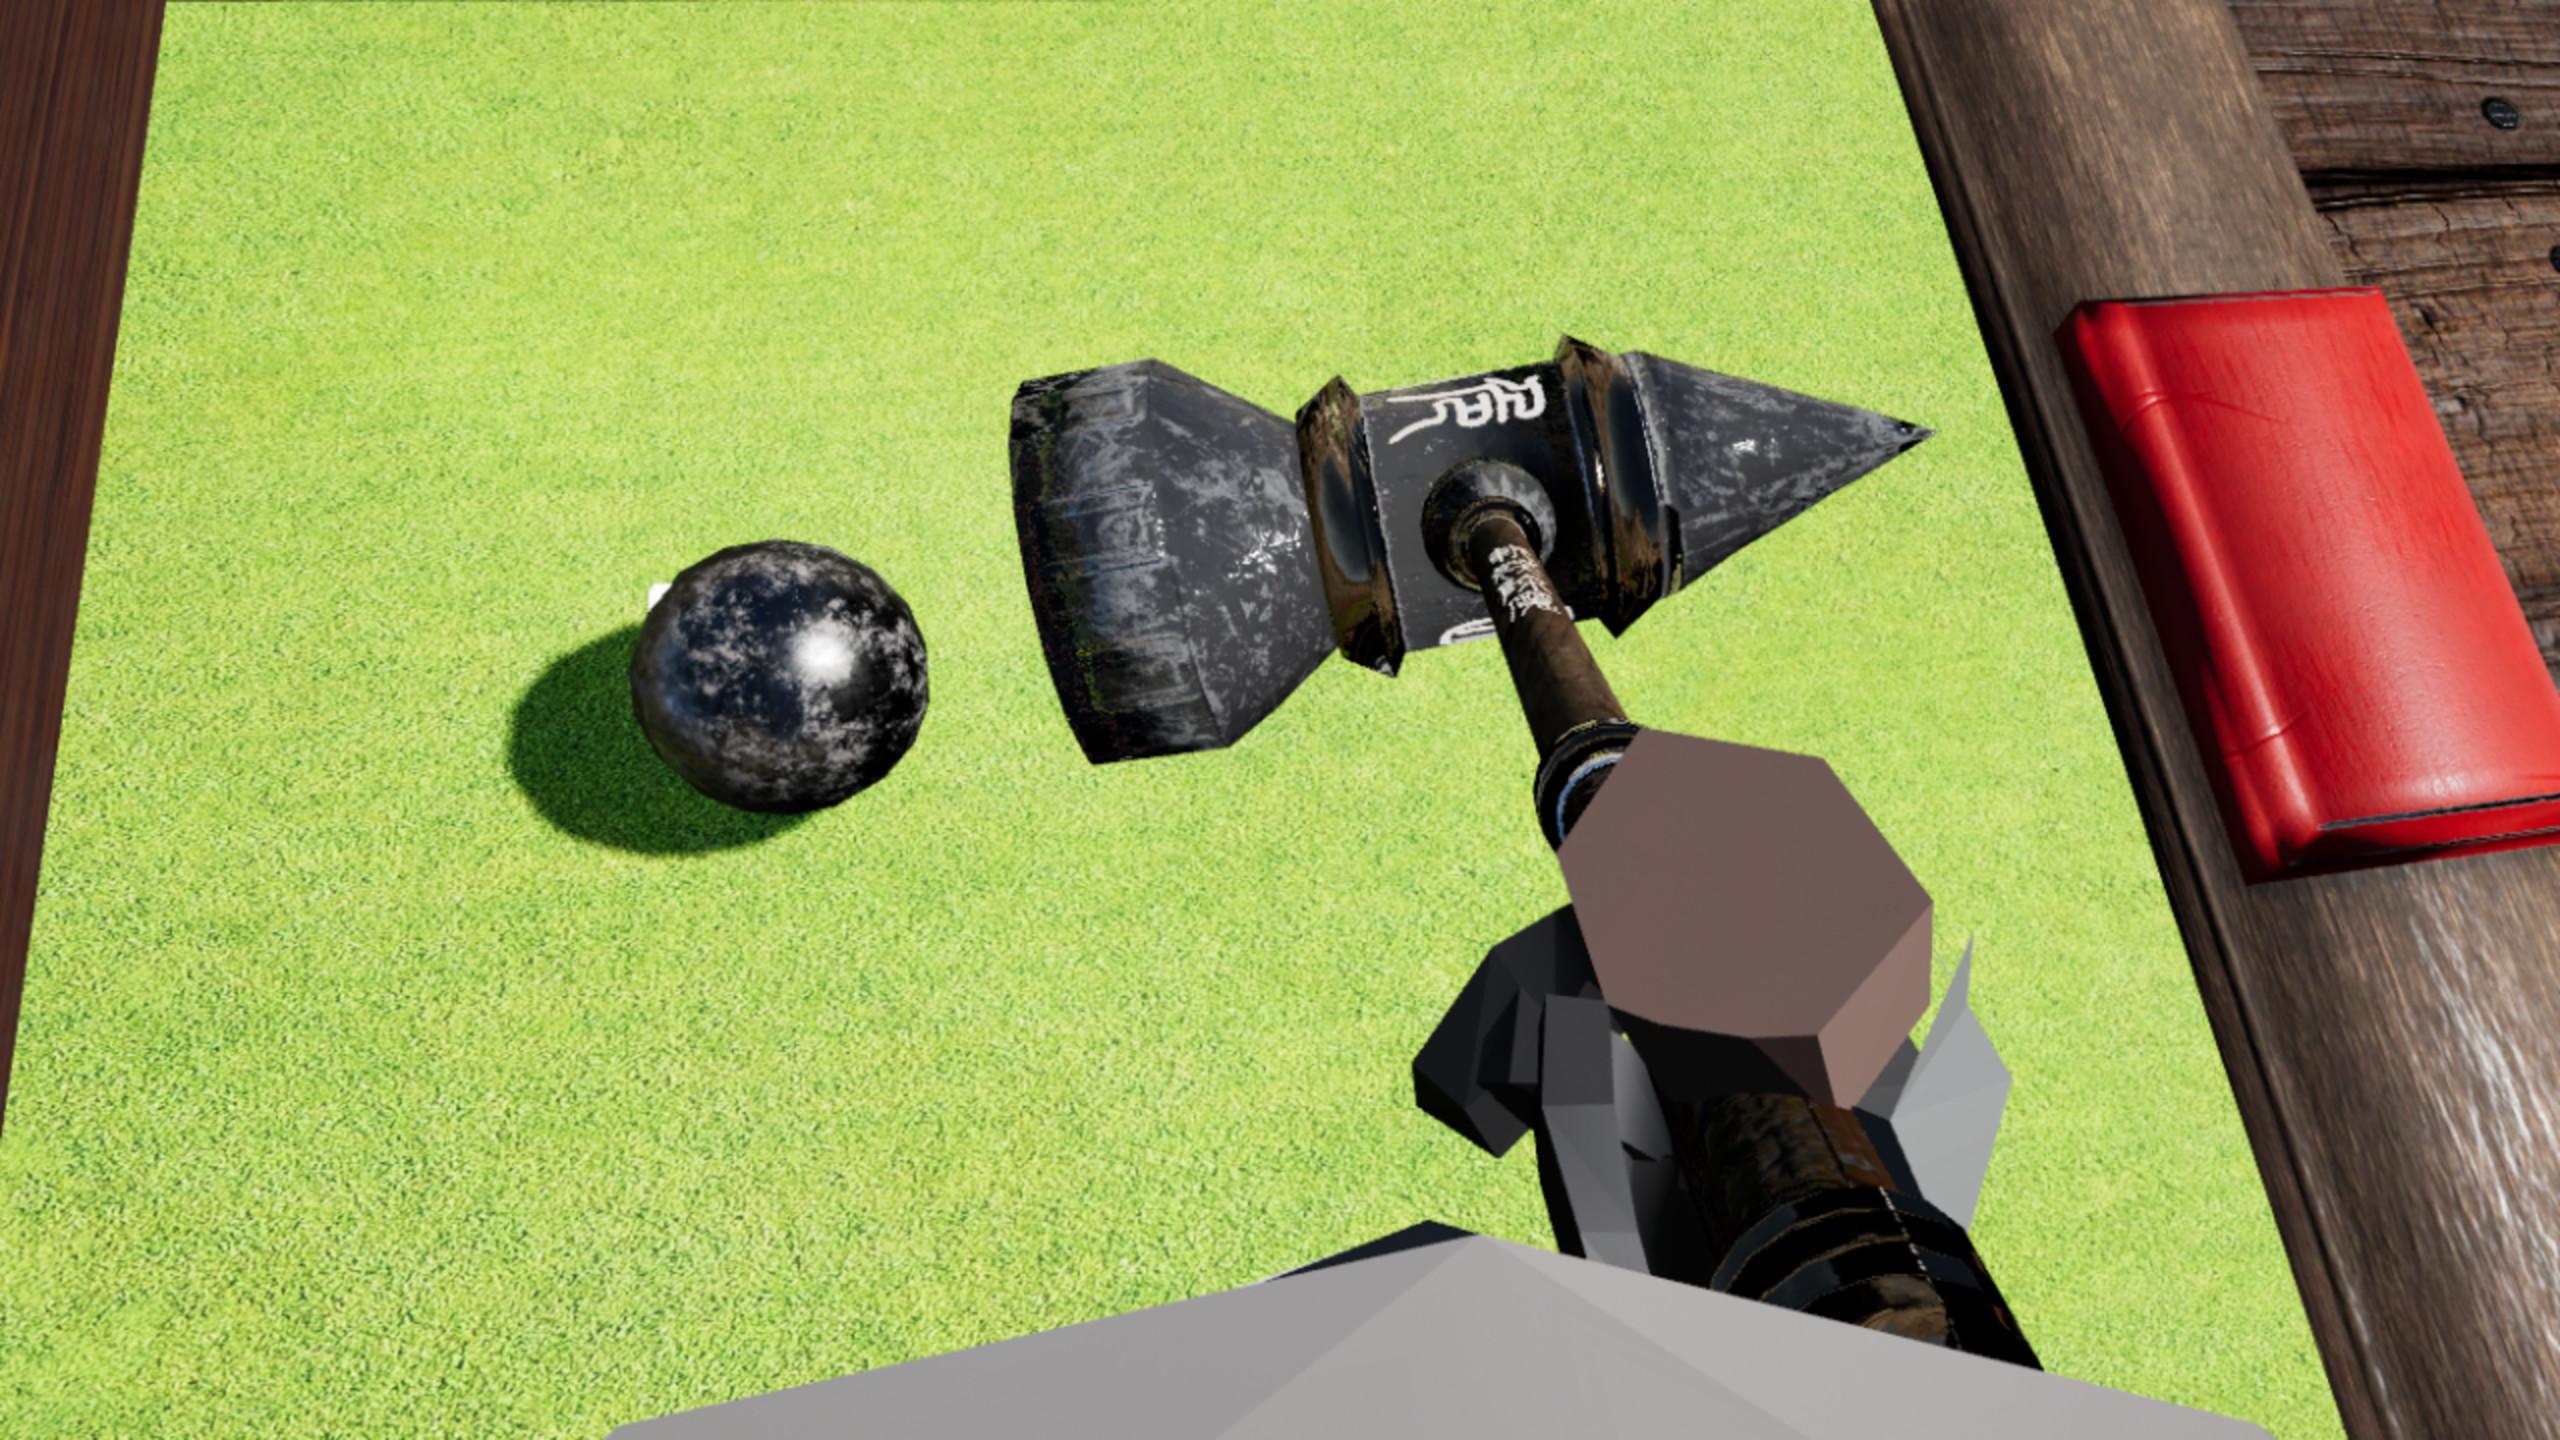 IgKnight Golf Defender screenshot